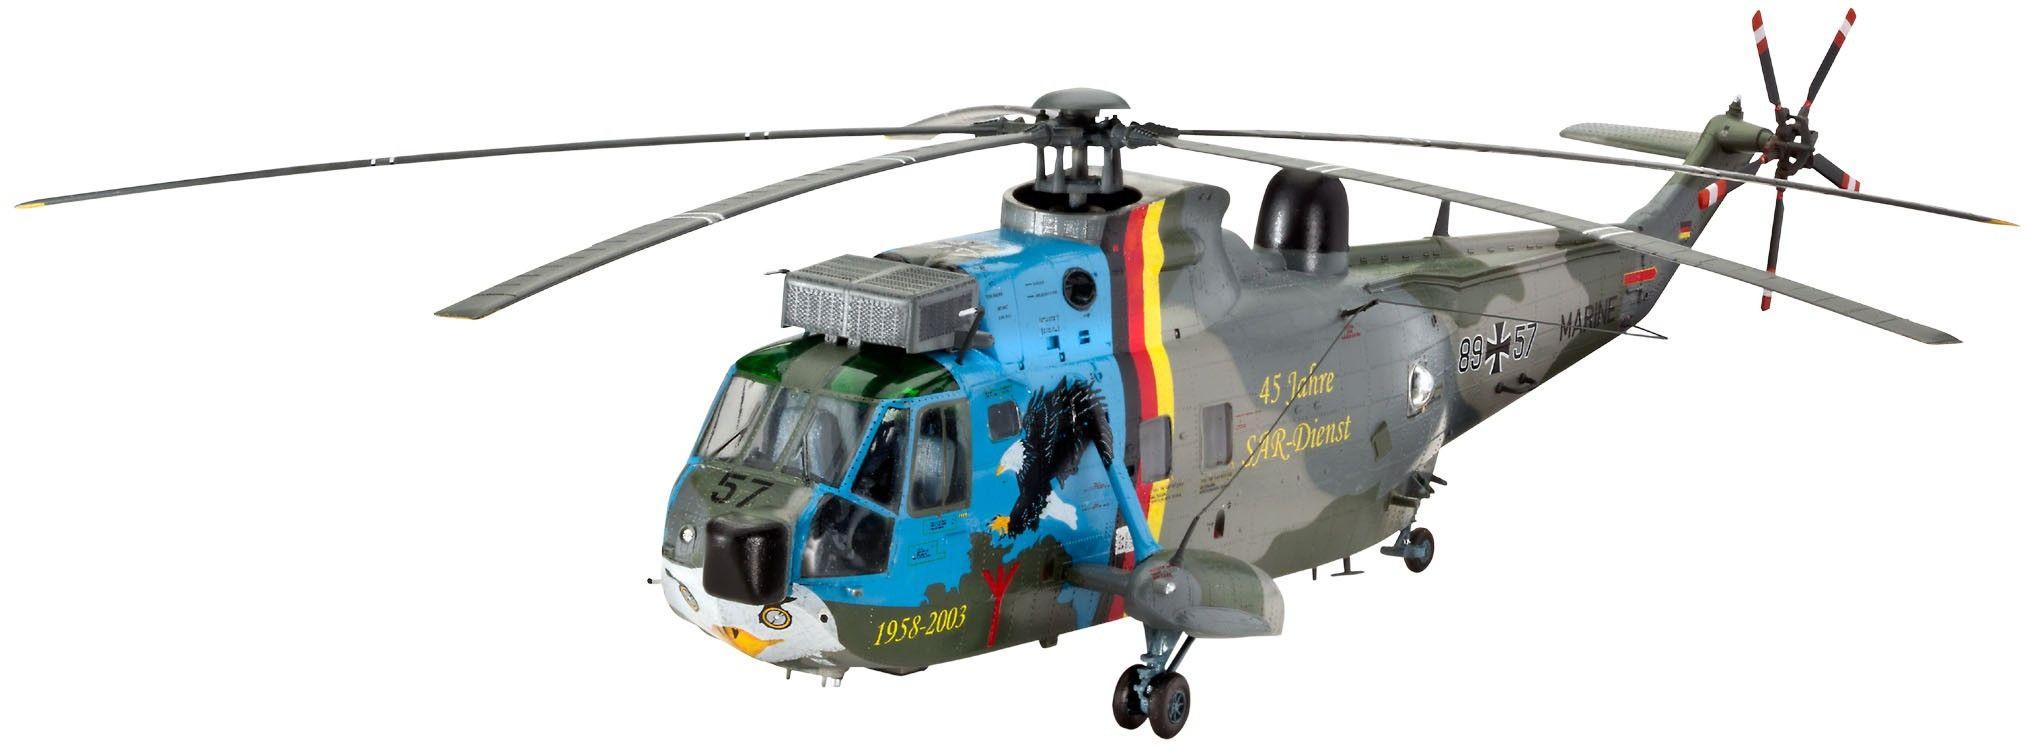 Сглобяем модел на военен хеликоптер Revell Westland - Sea King Mk.41 (45 years SAR) (04899) - 1